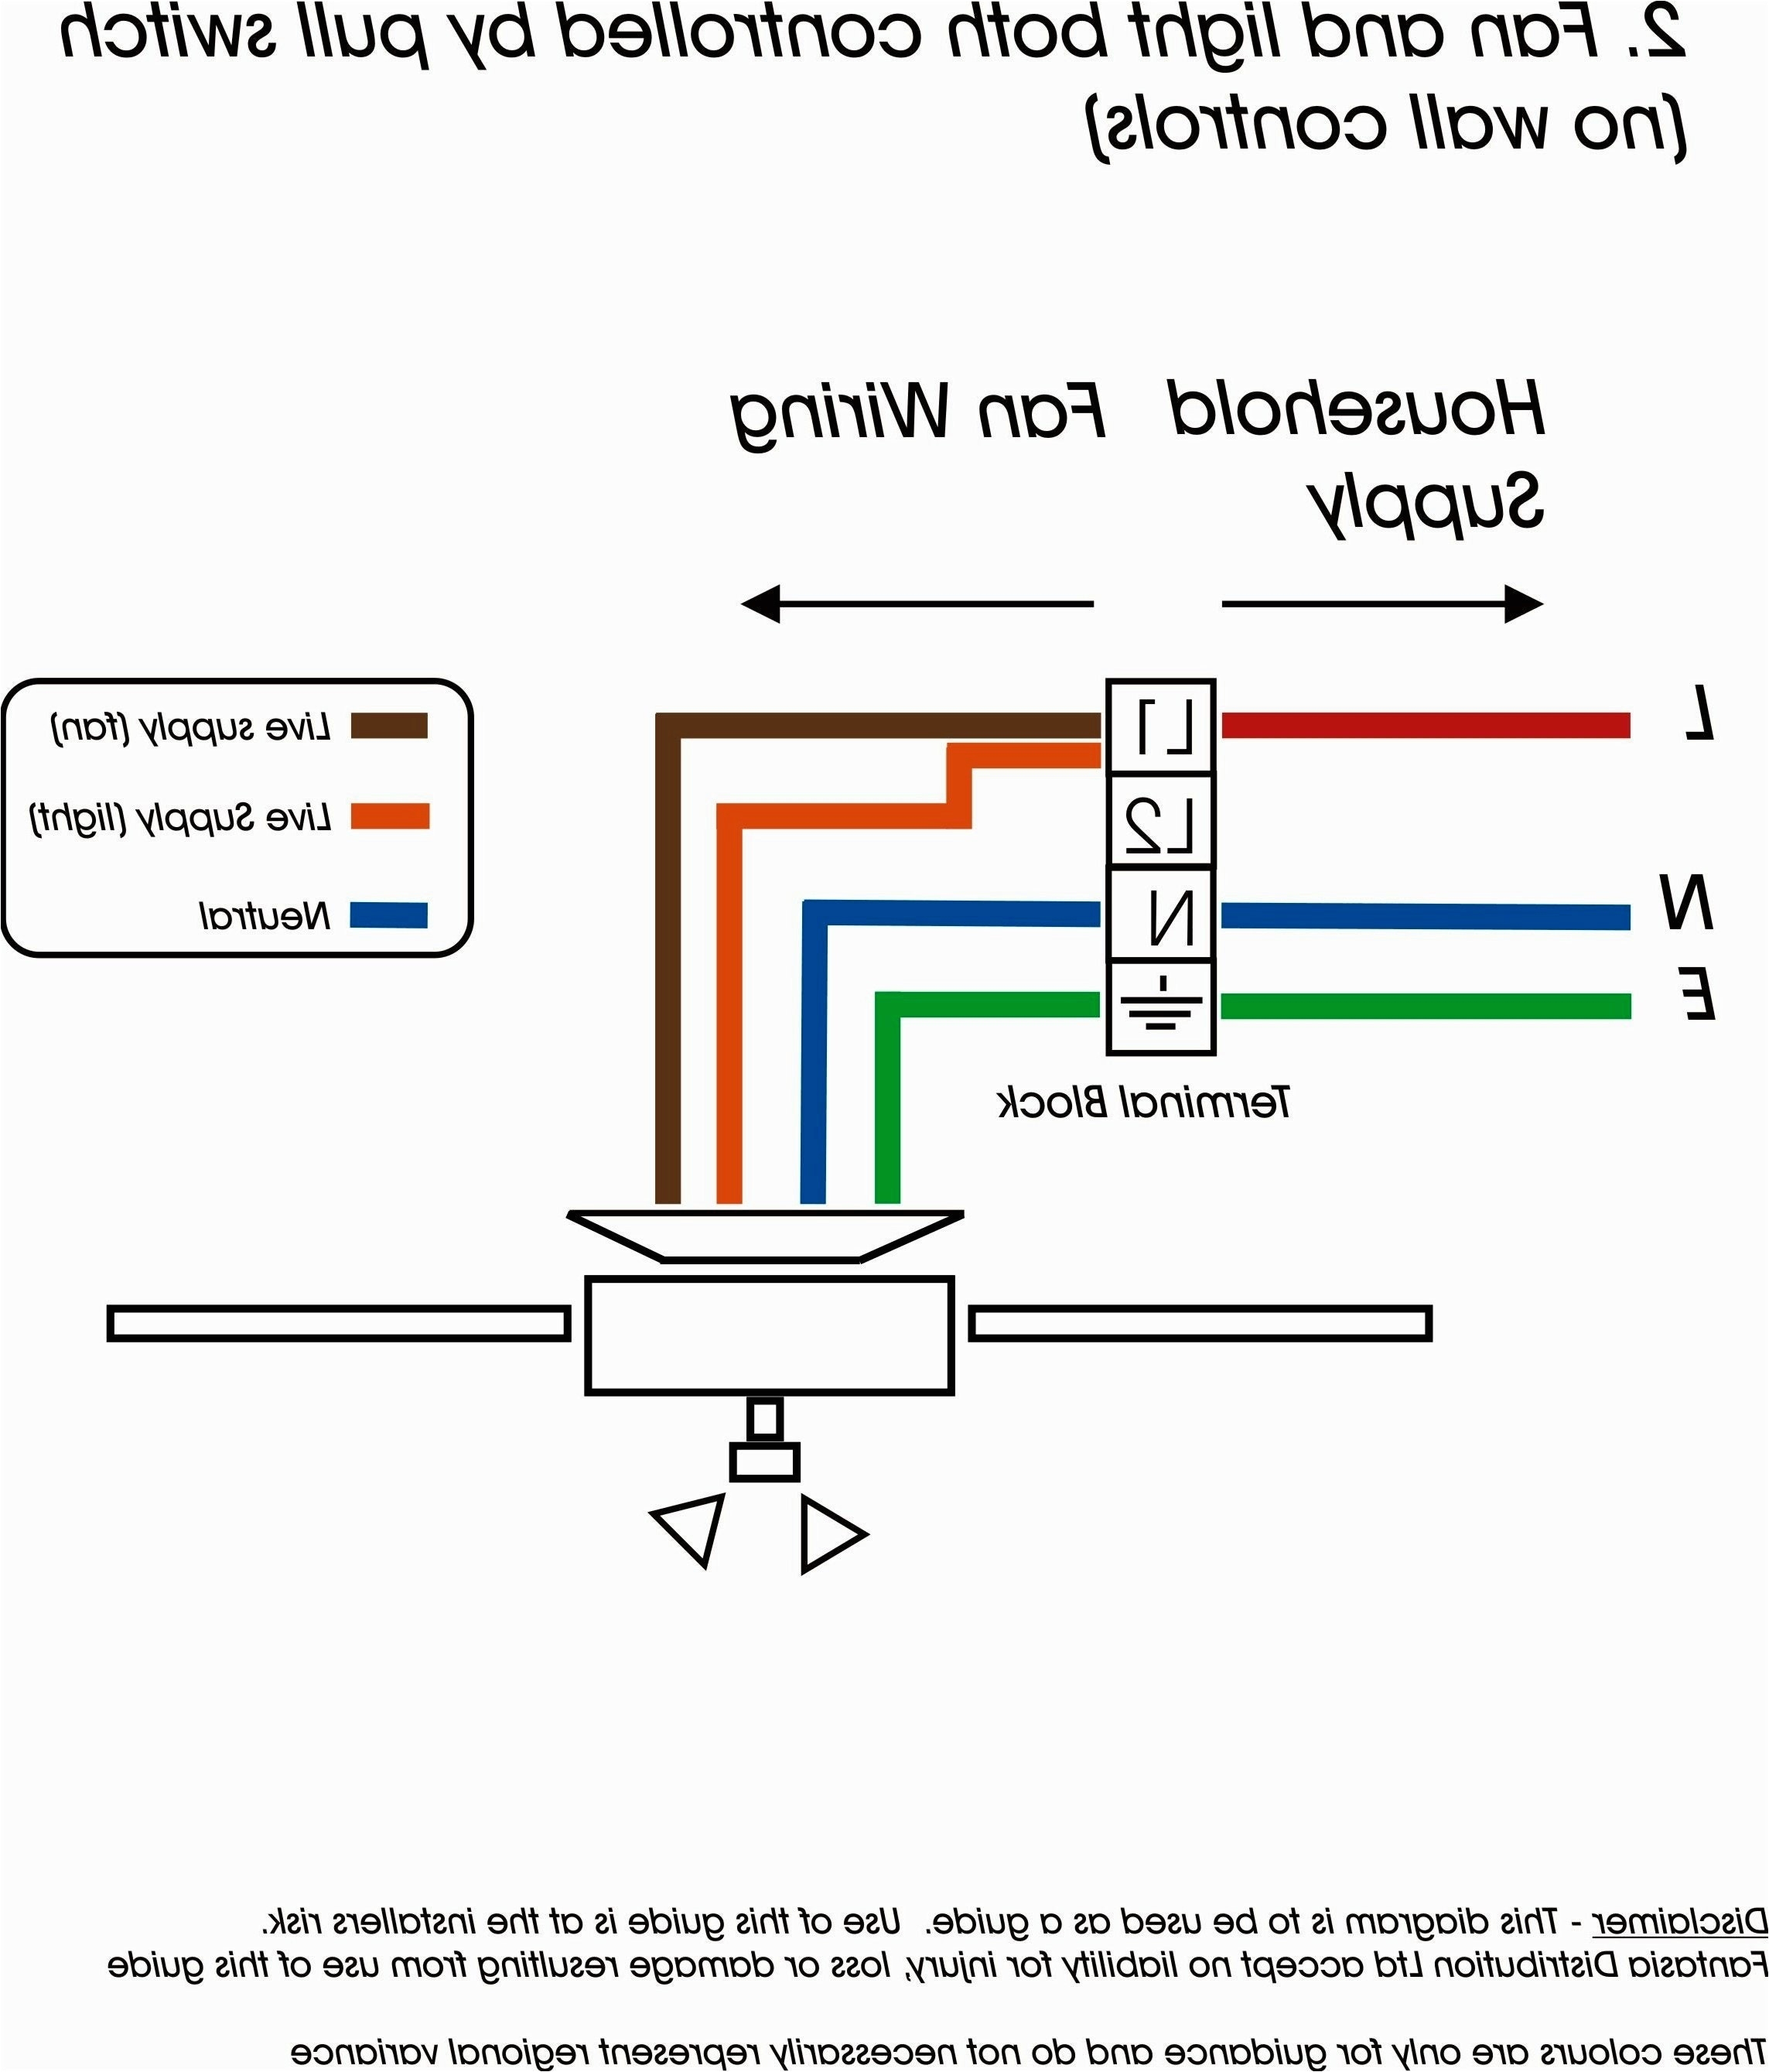 emg bass pickups wiring diagram beautiful emg pickups wiring diagram lovely guitar wiring diagram single